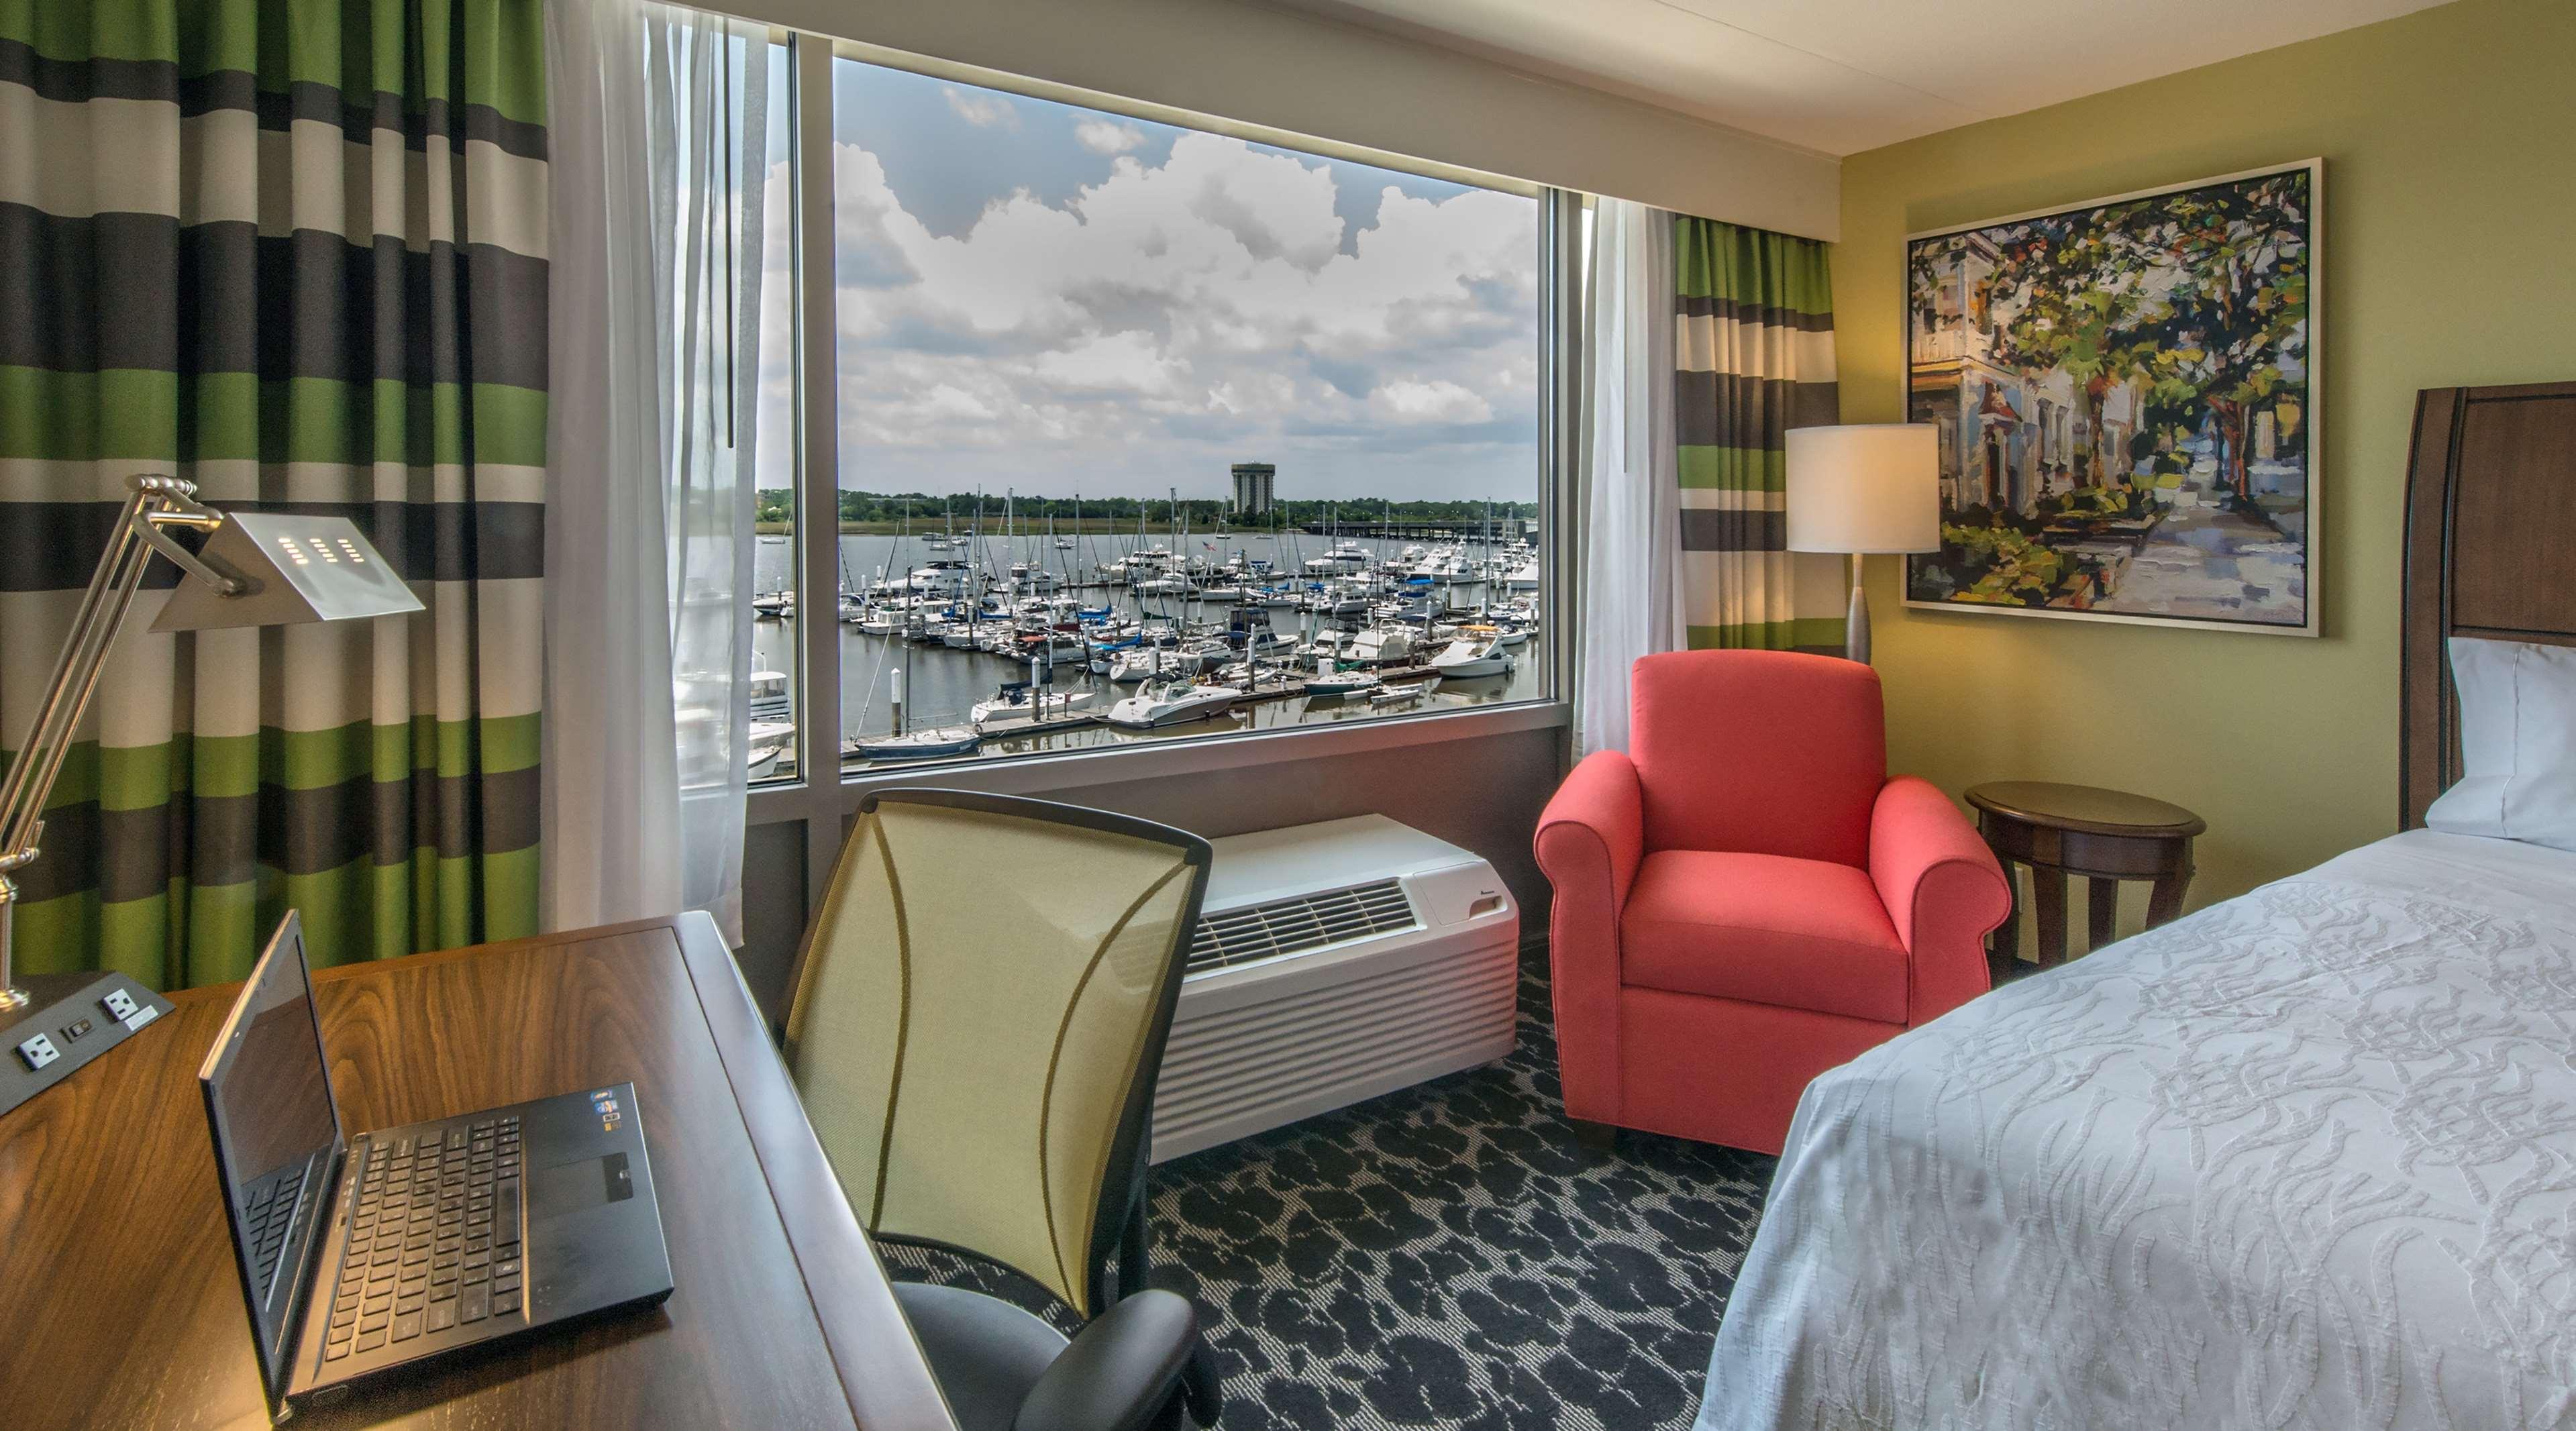 Hilton Garden Inn Charleston Waterfront/Downtown image 23